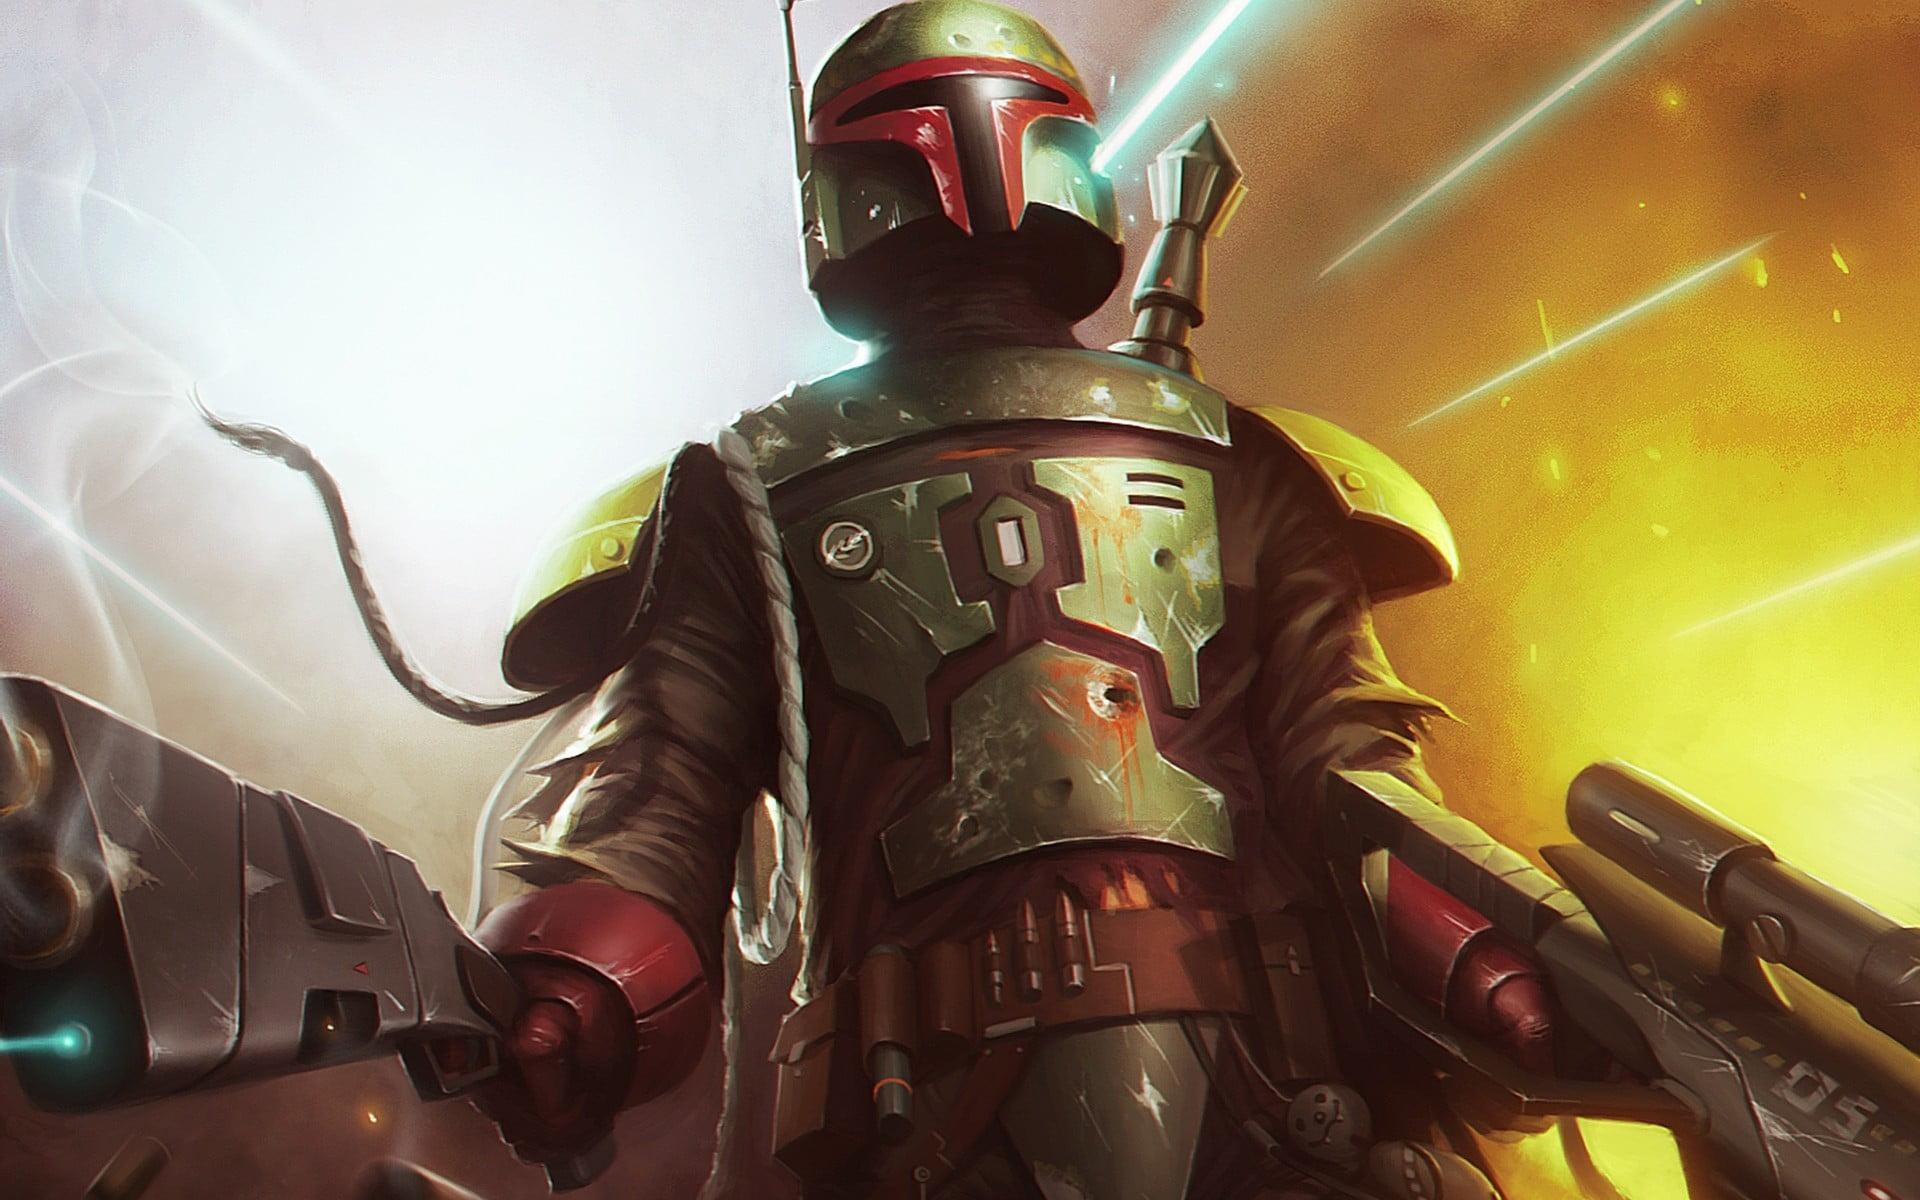 Star Wars Boba Fett Art 3116913 Hd Wallpaper Backgrounds Download